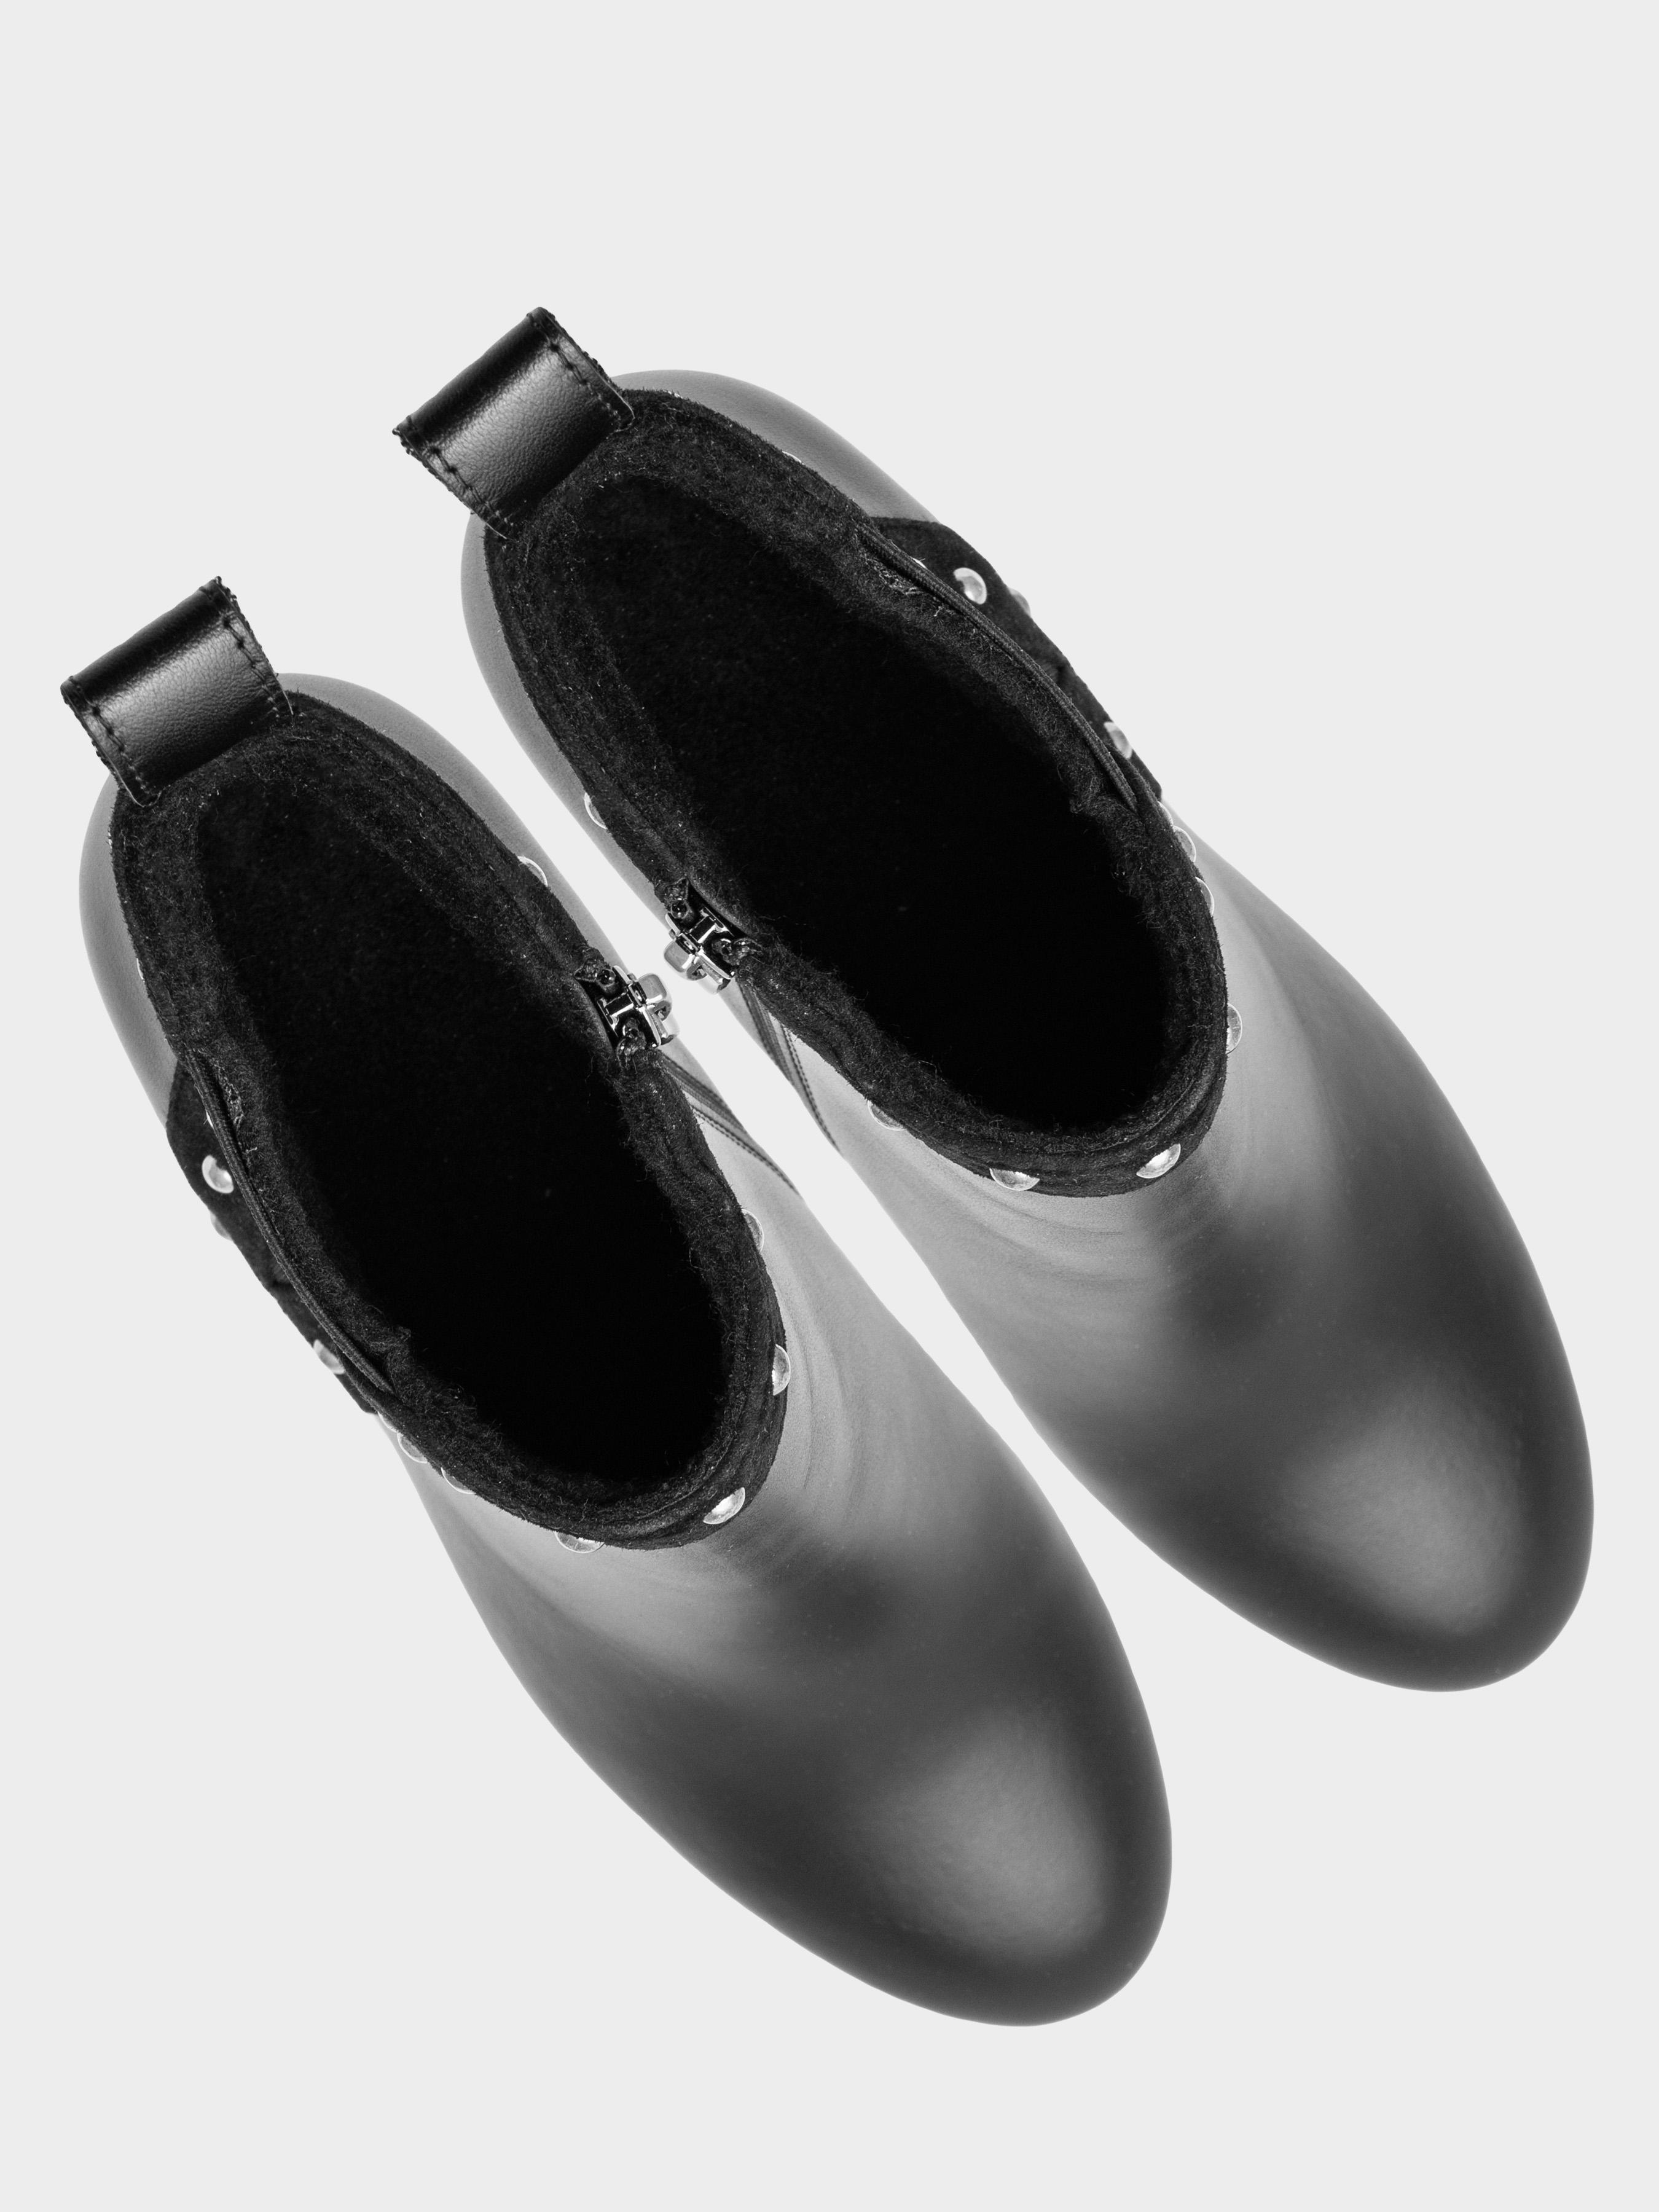 Ботинки для женщин Ботинки женские ENZO VERRATTI 18-9588-2l примерка, 2017